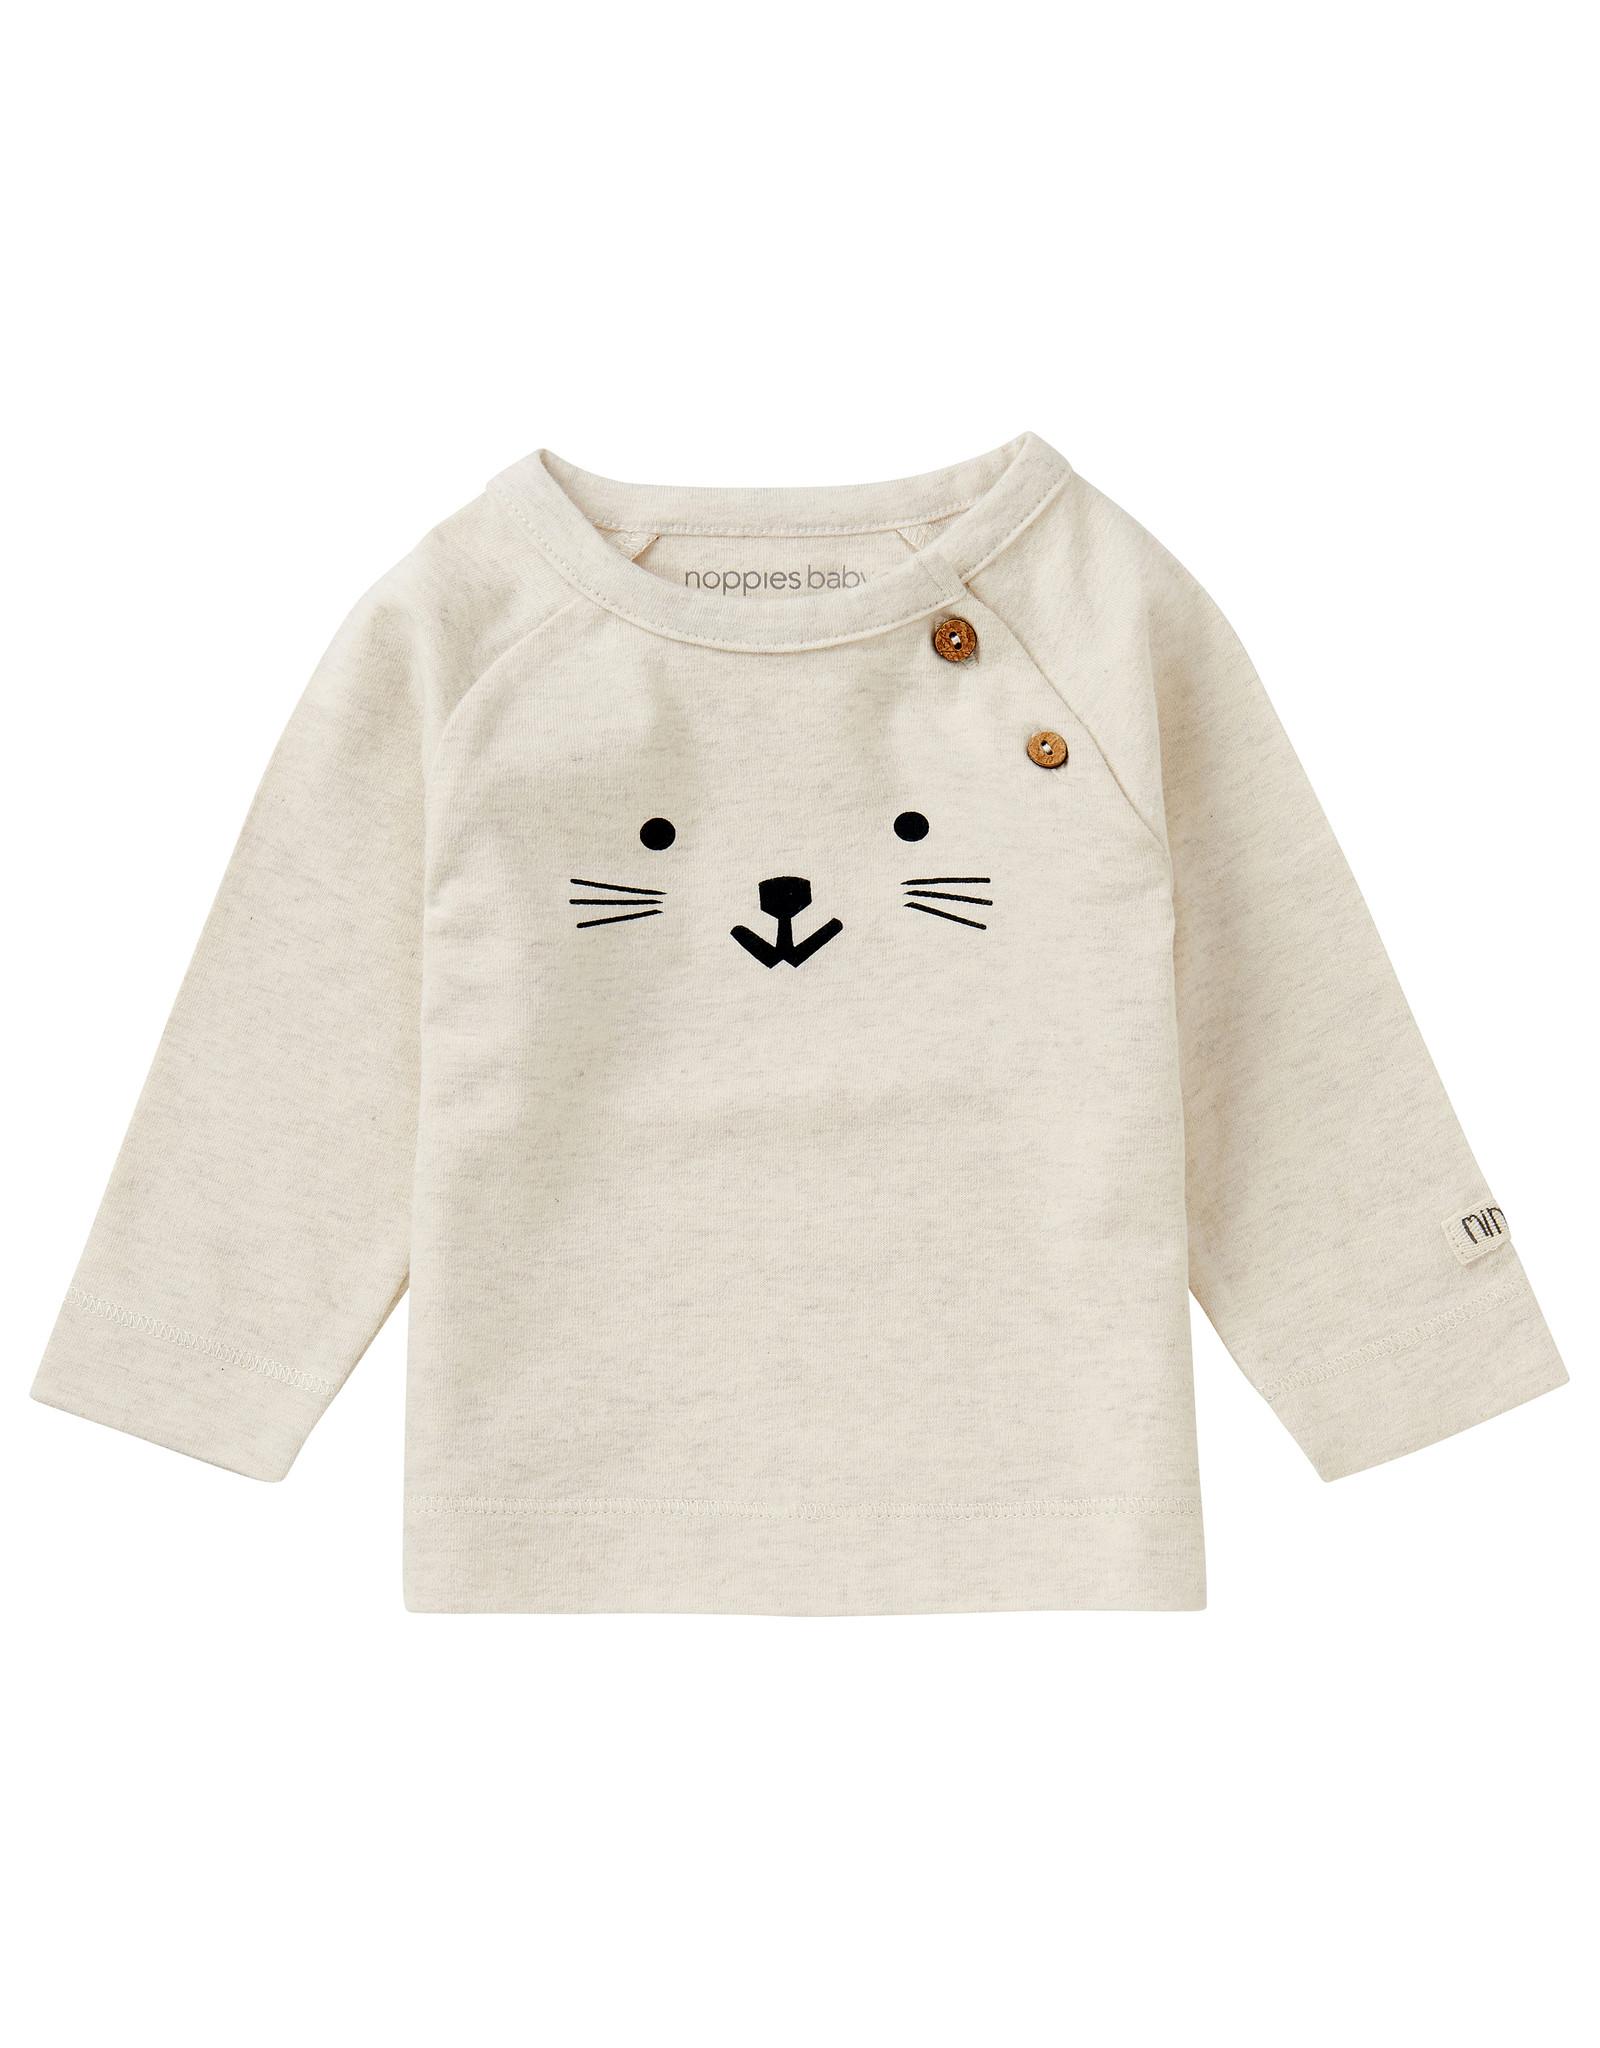 Noppies U T-Shirt LS Arlington, Oatmeal